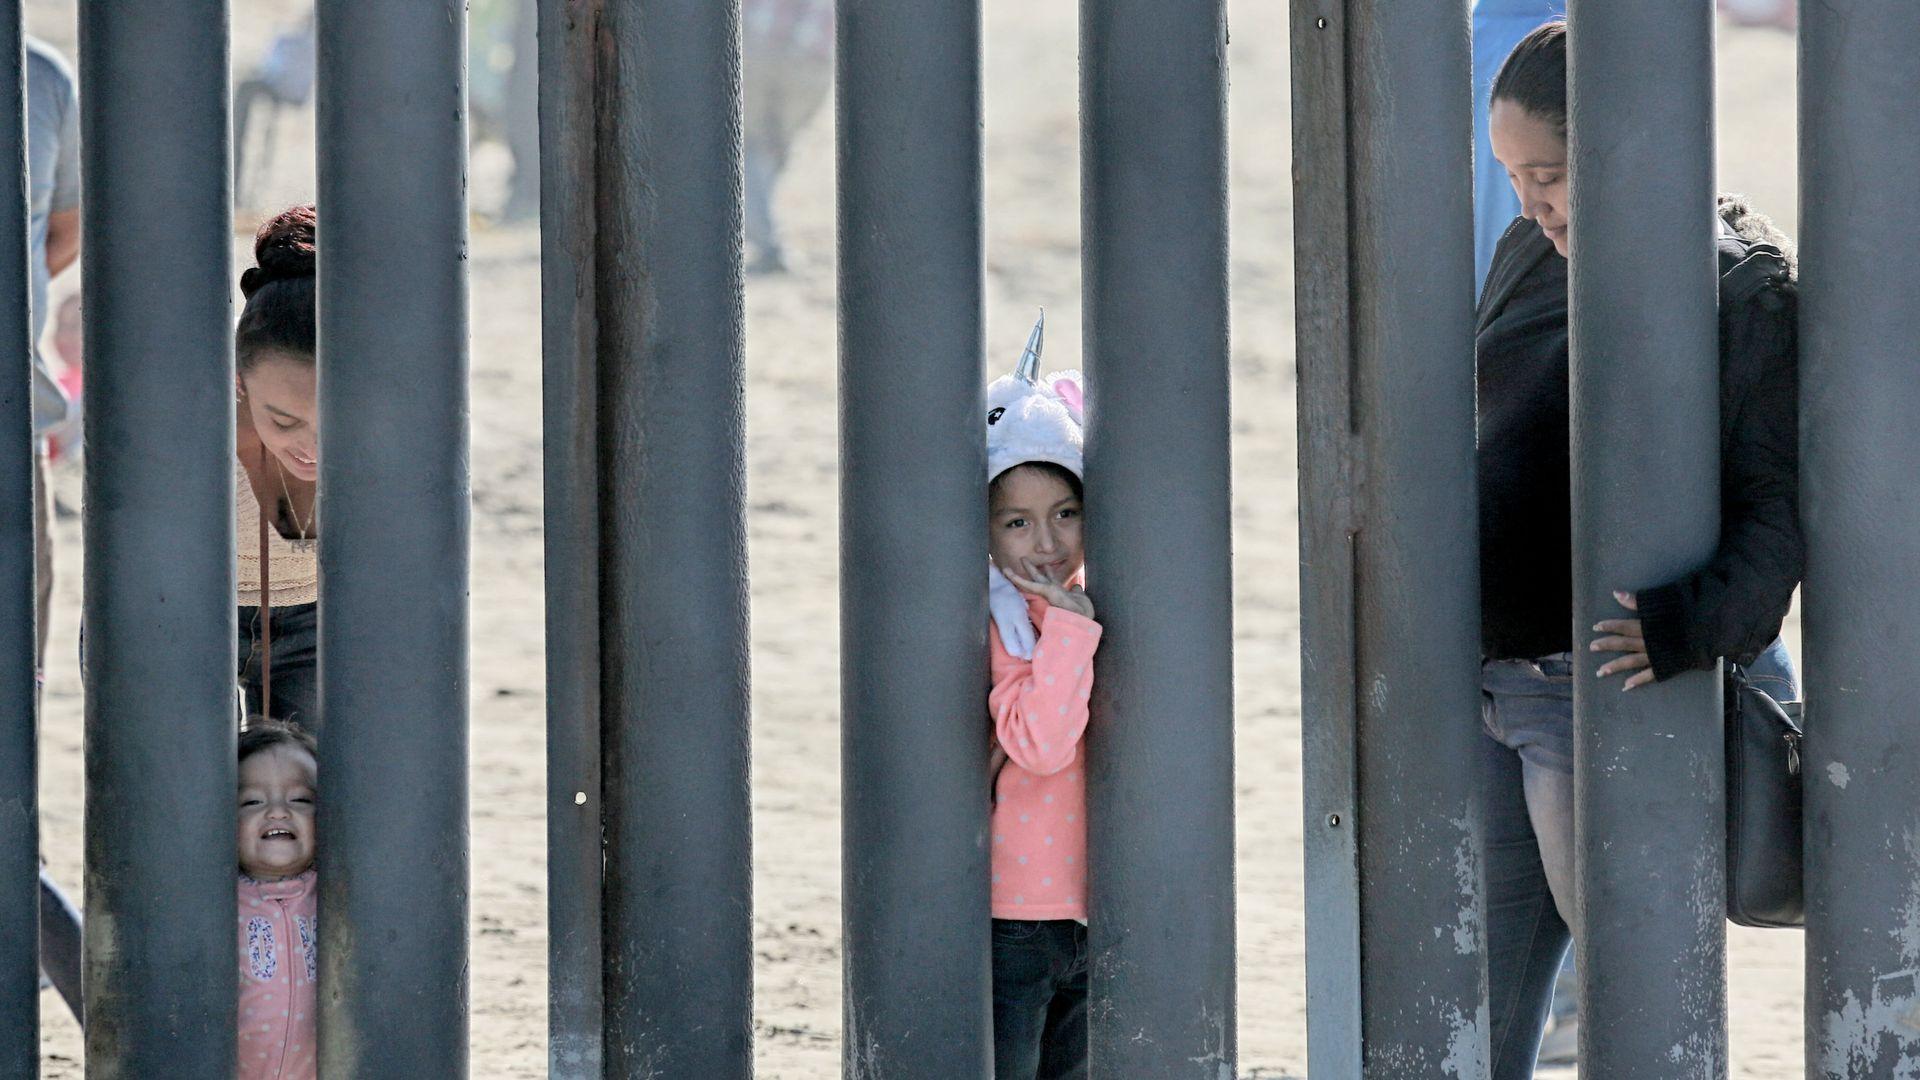 The southern border wall at Friendship park in San Ysidro, California.